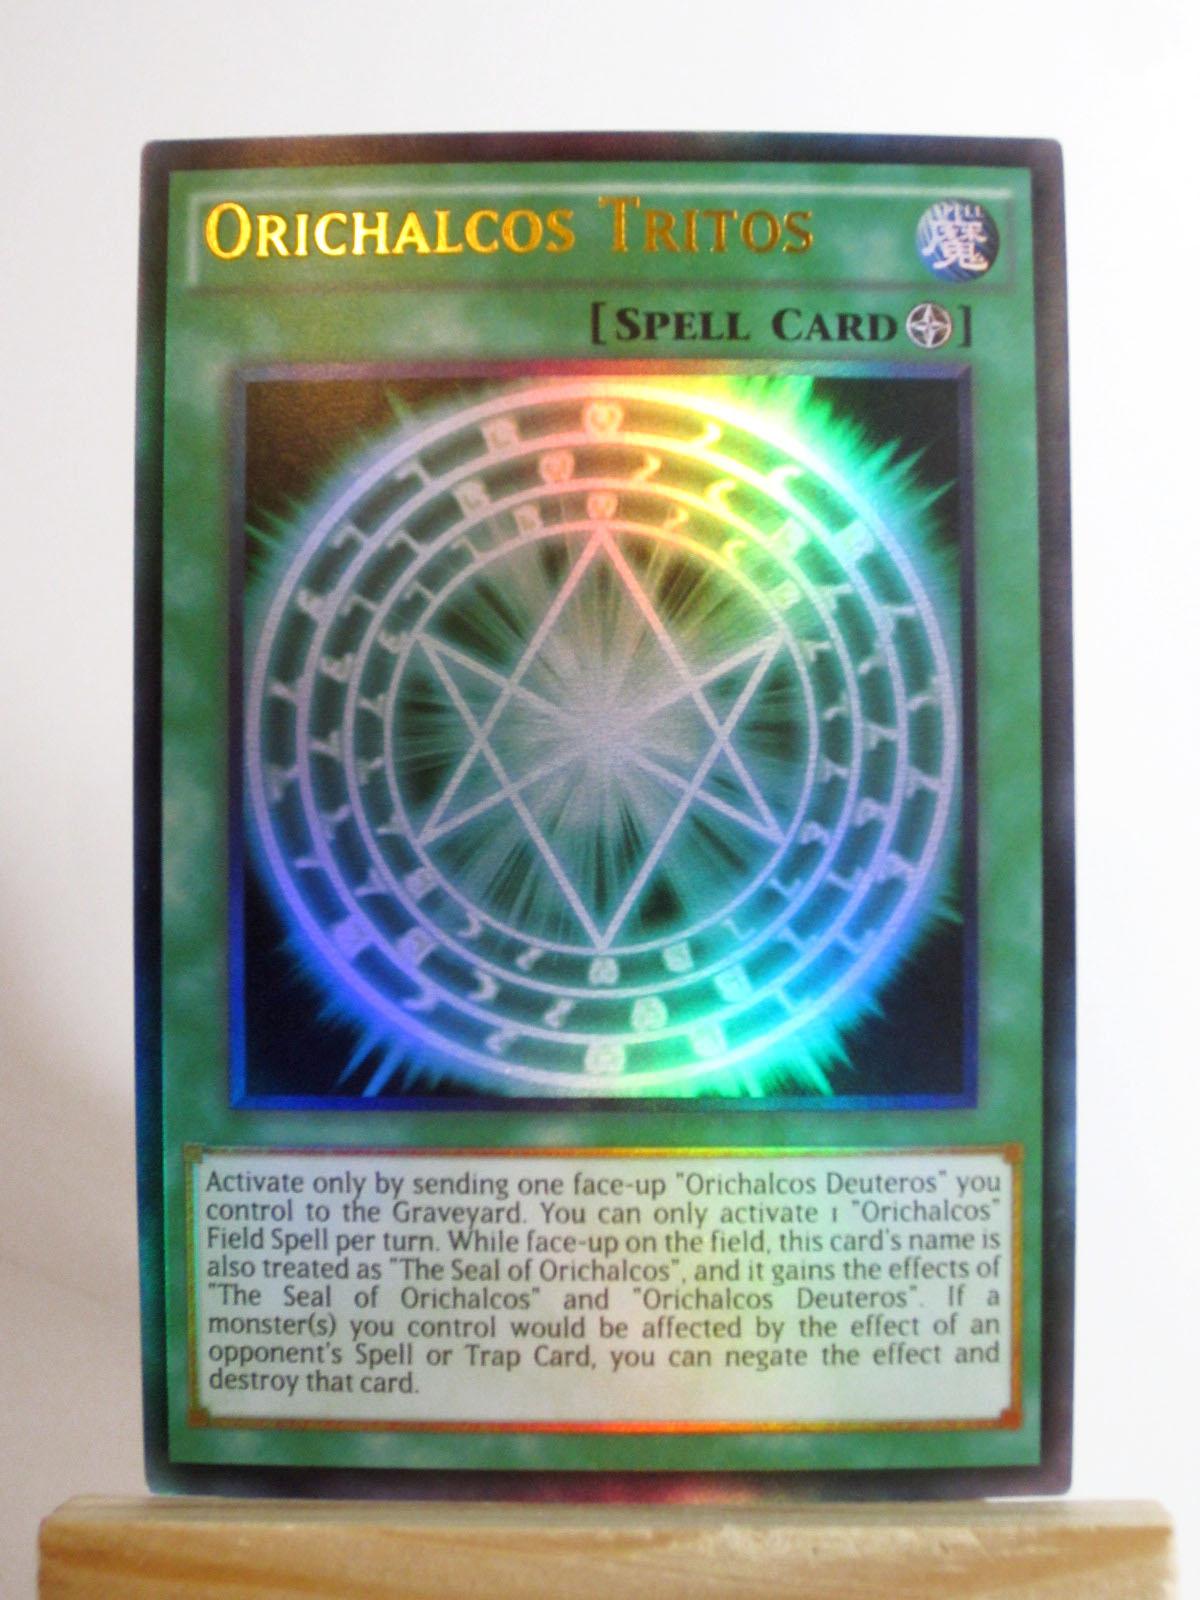 Orichalcos Tritos - Or...